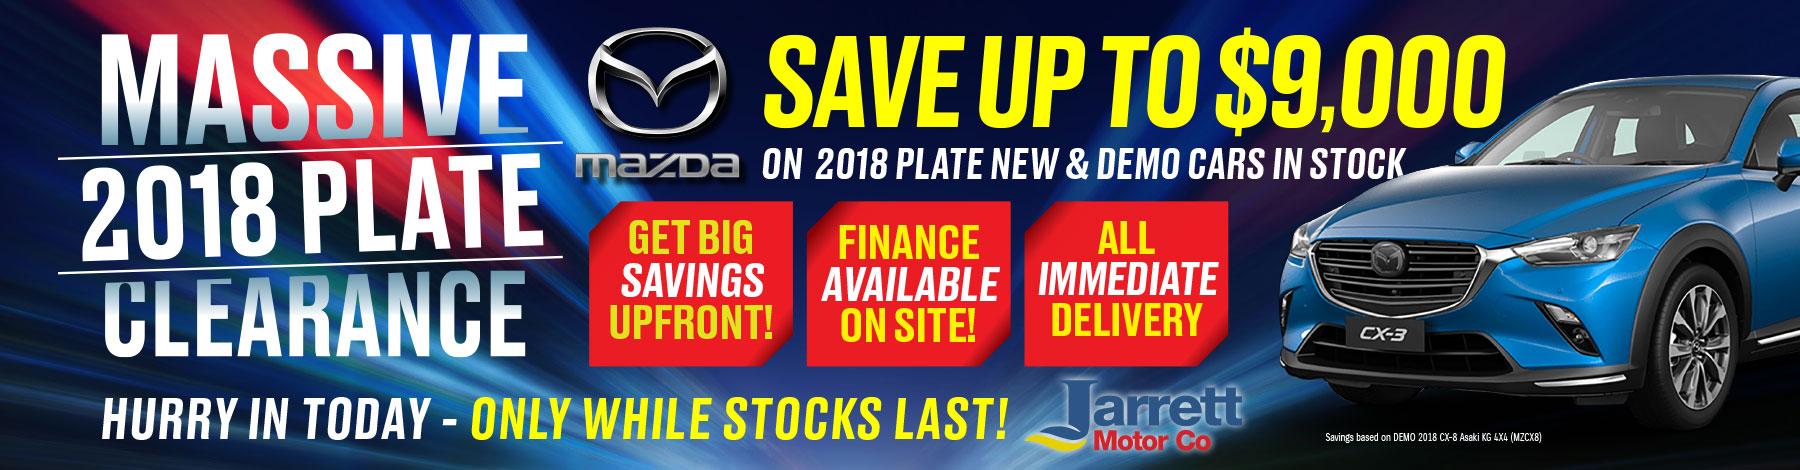 Jarrett Mazda - 2018 Plate Clearance